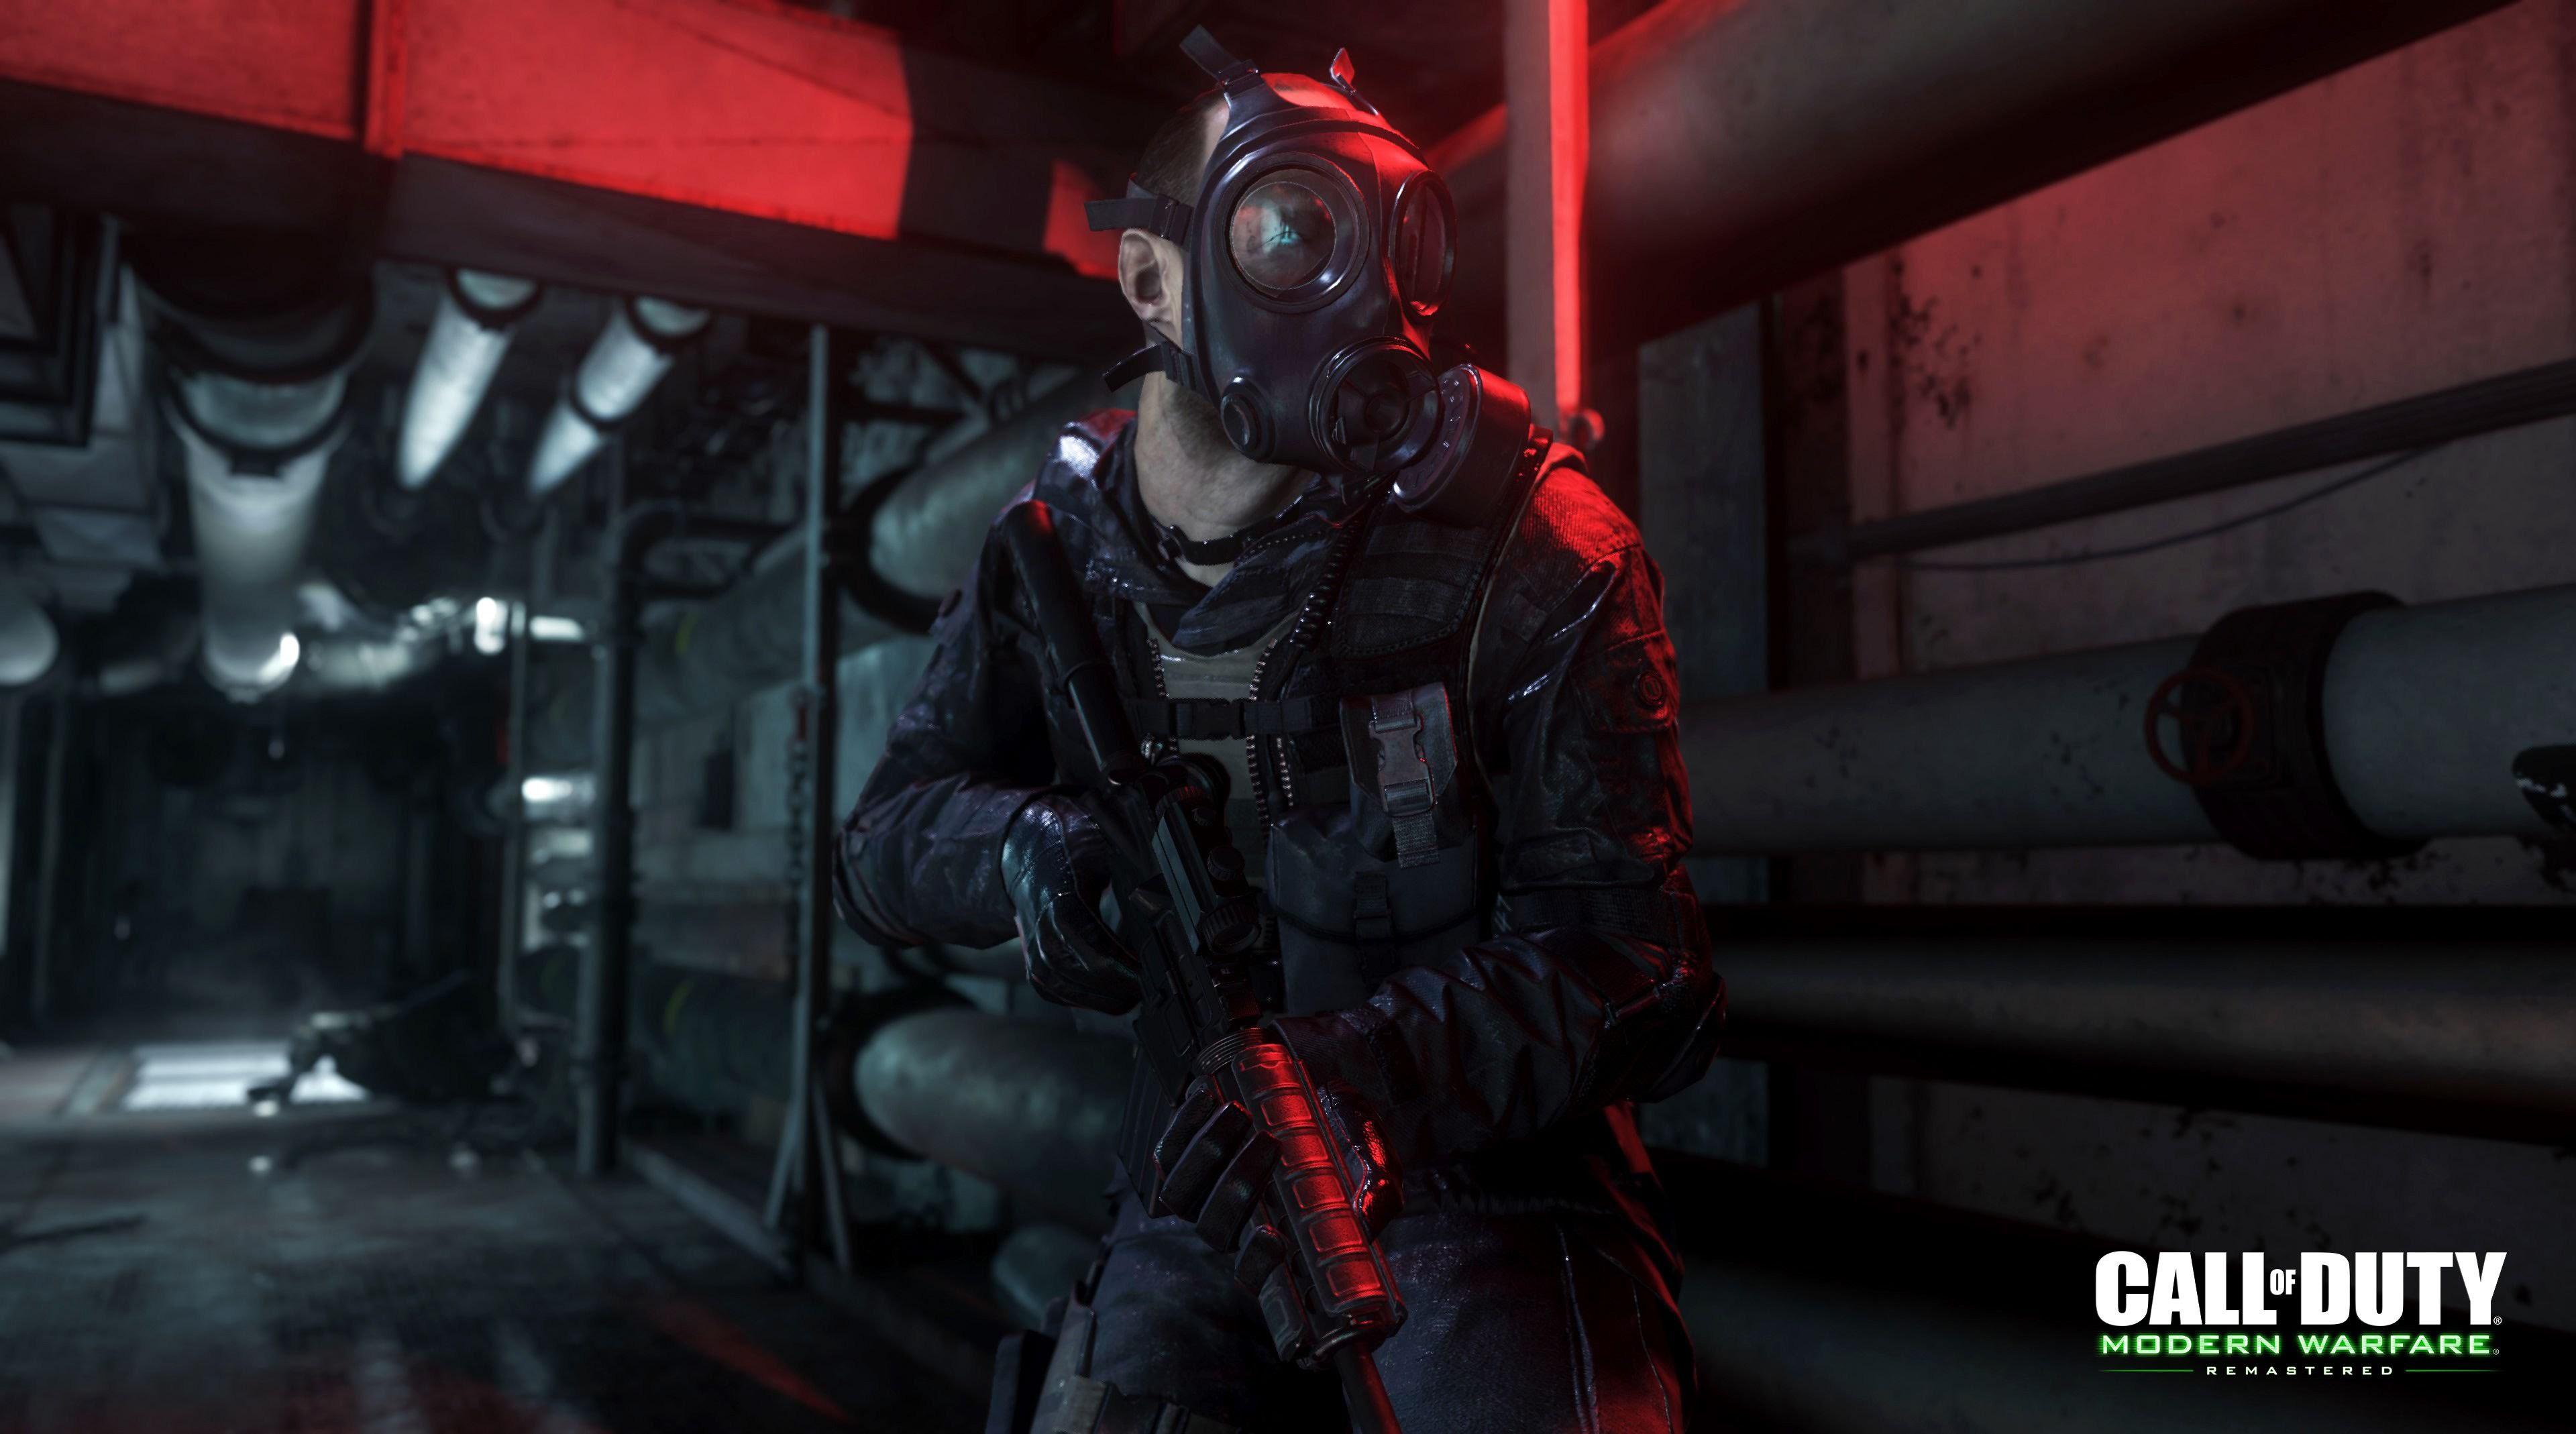 Call Of Duty Modern Warfare Remastered Photos